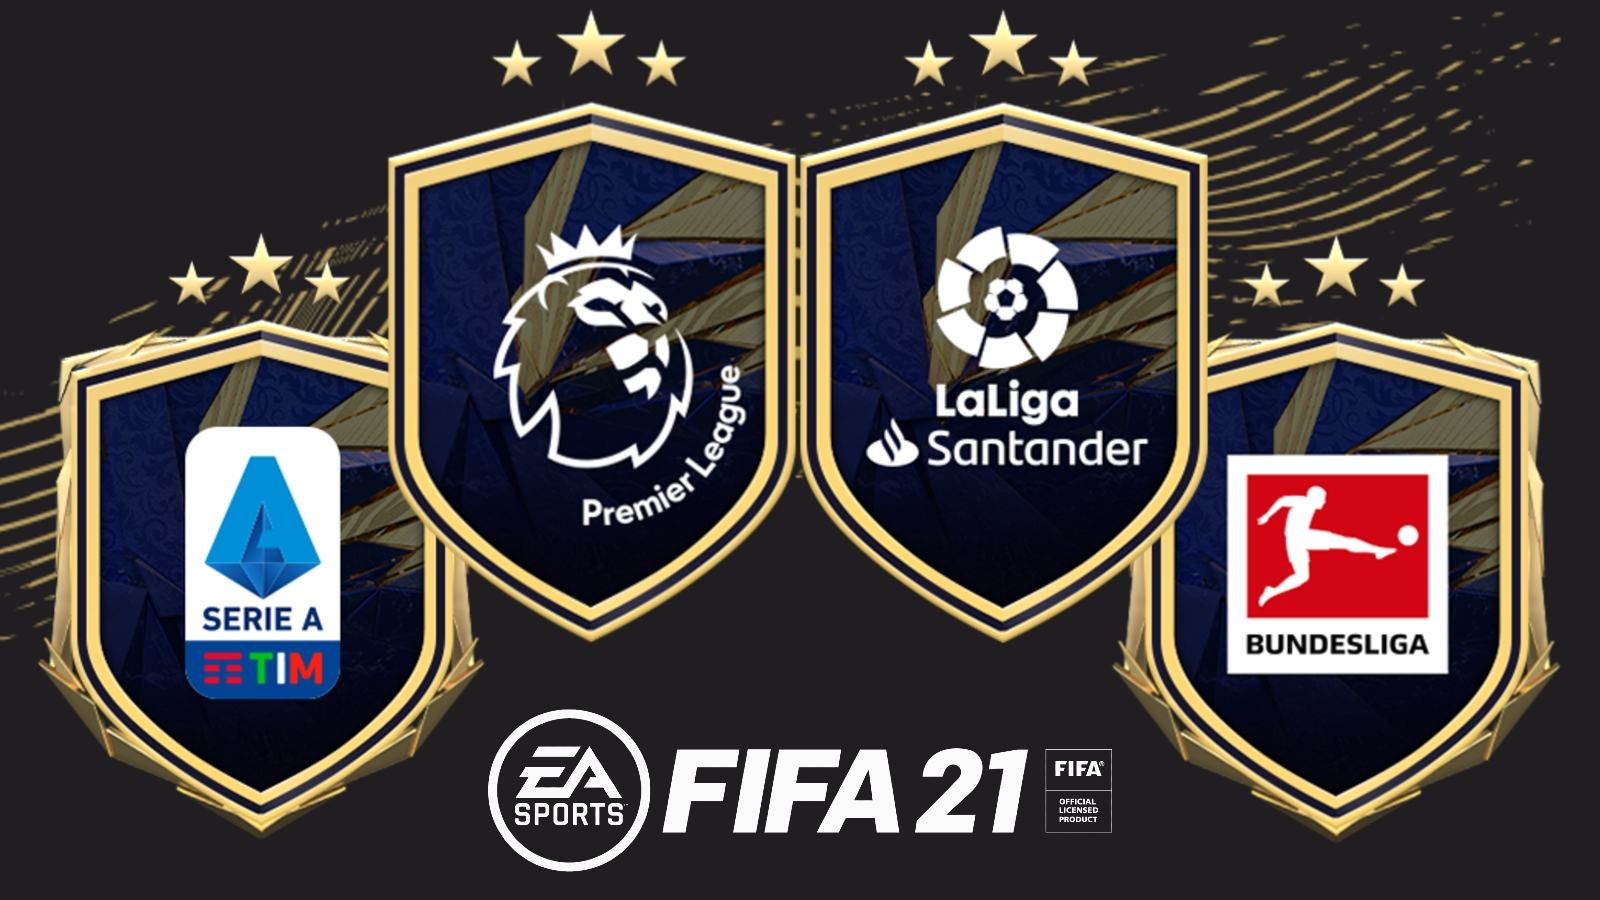 FIFA 21 premier league la liga bundesliga serie a upgrade sbc